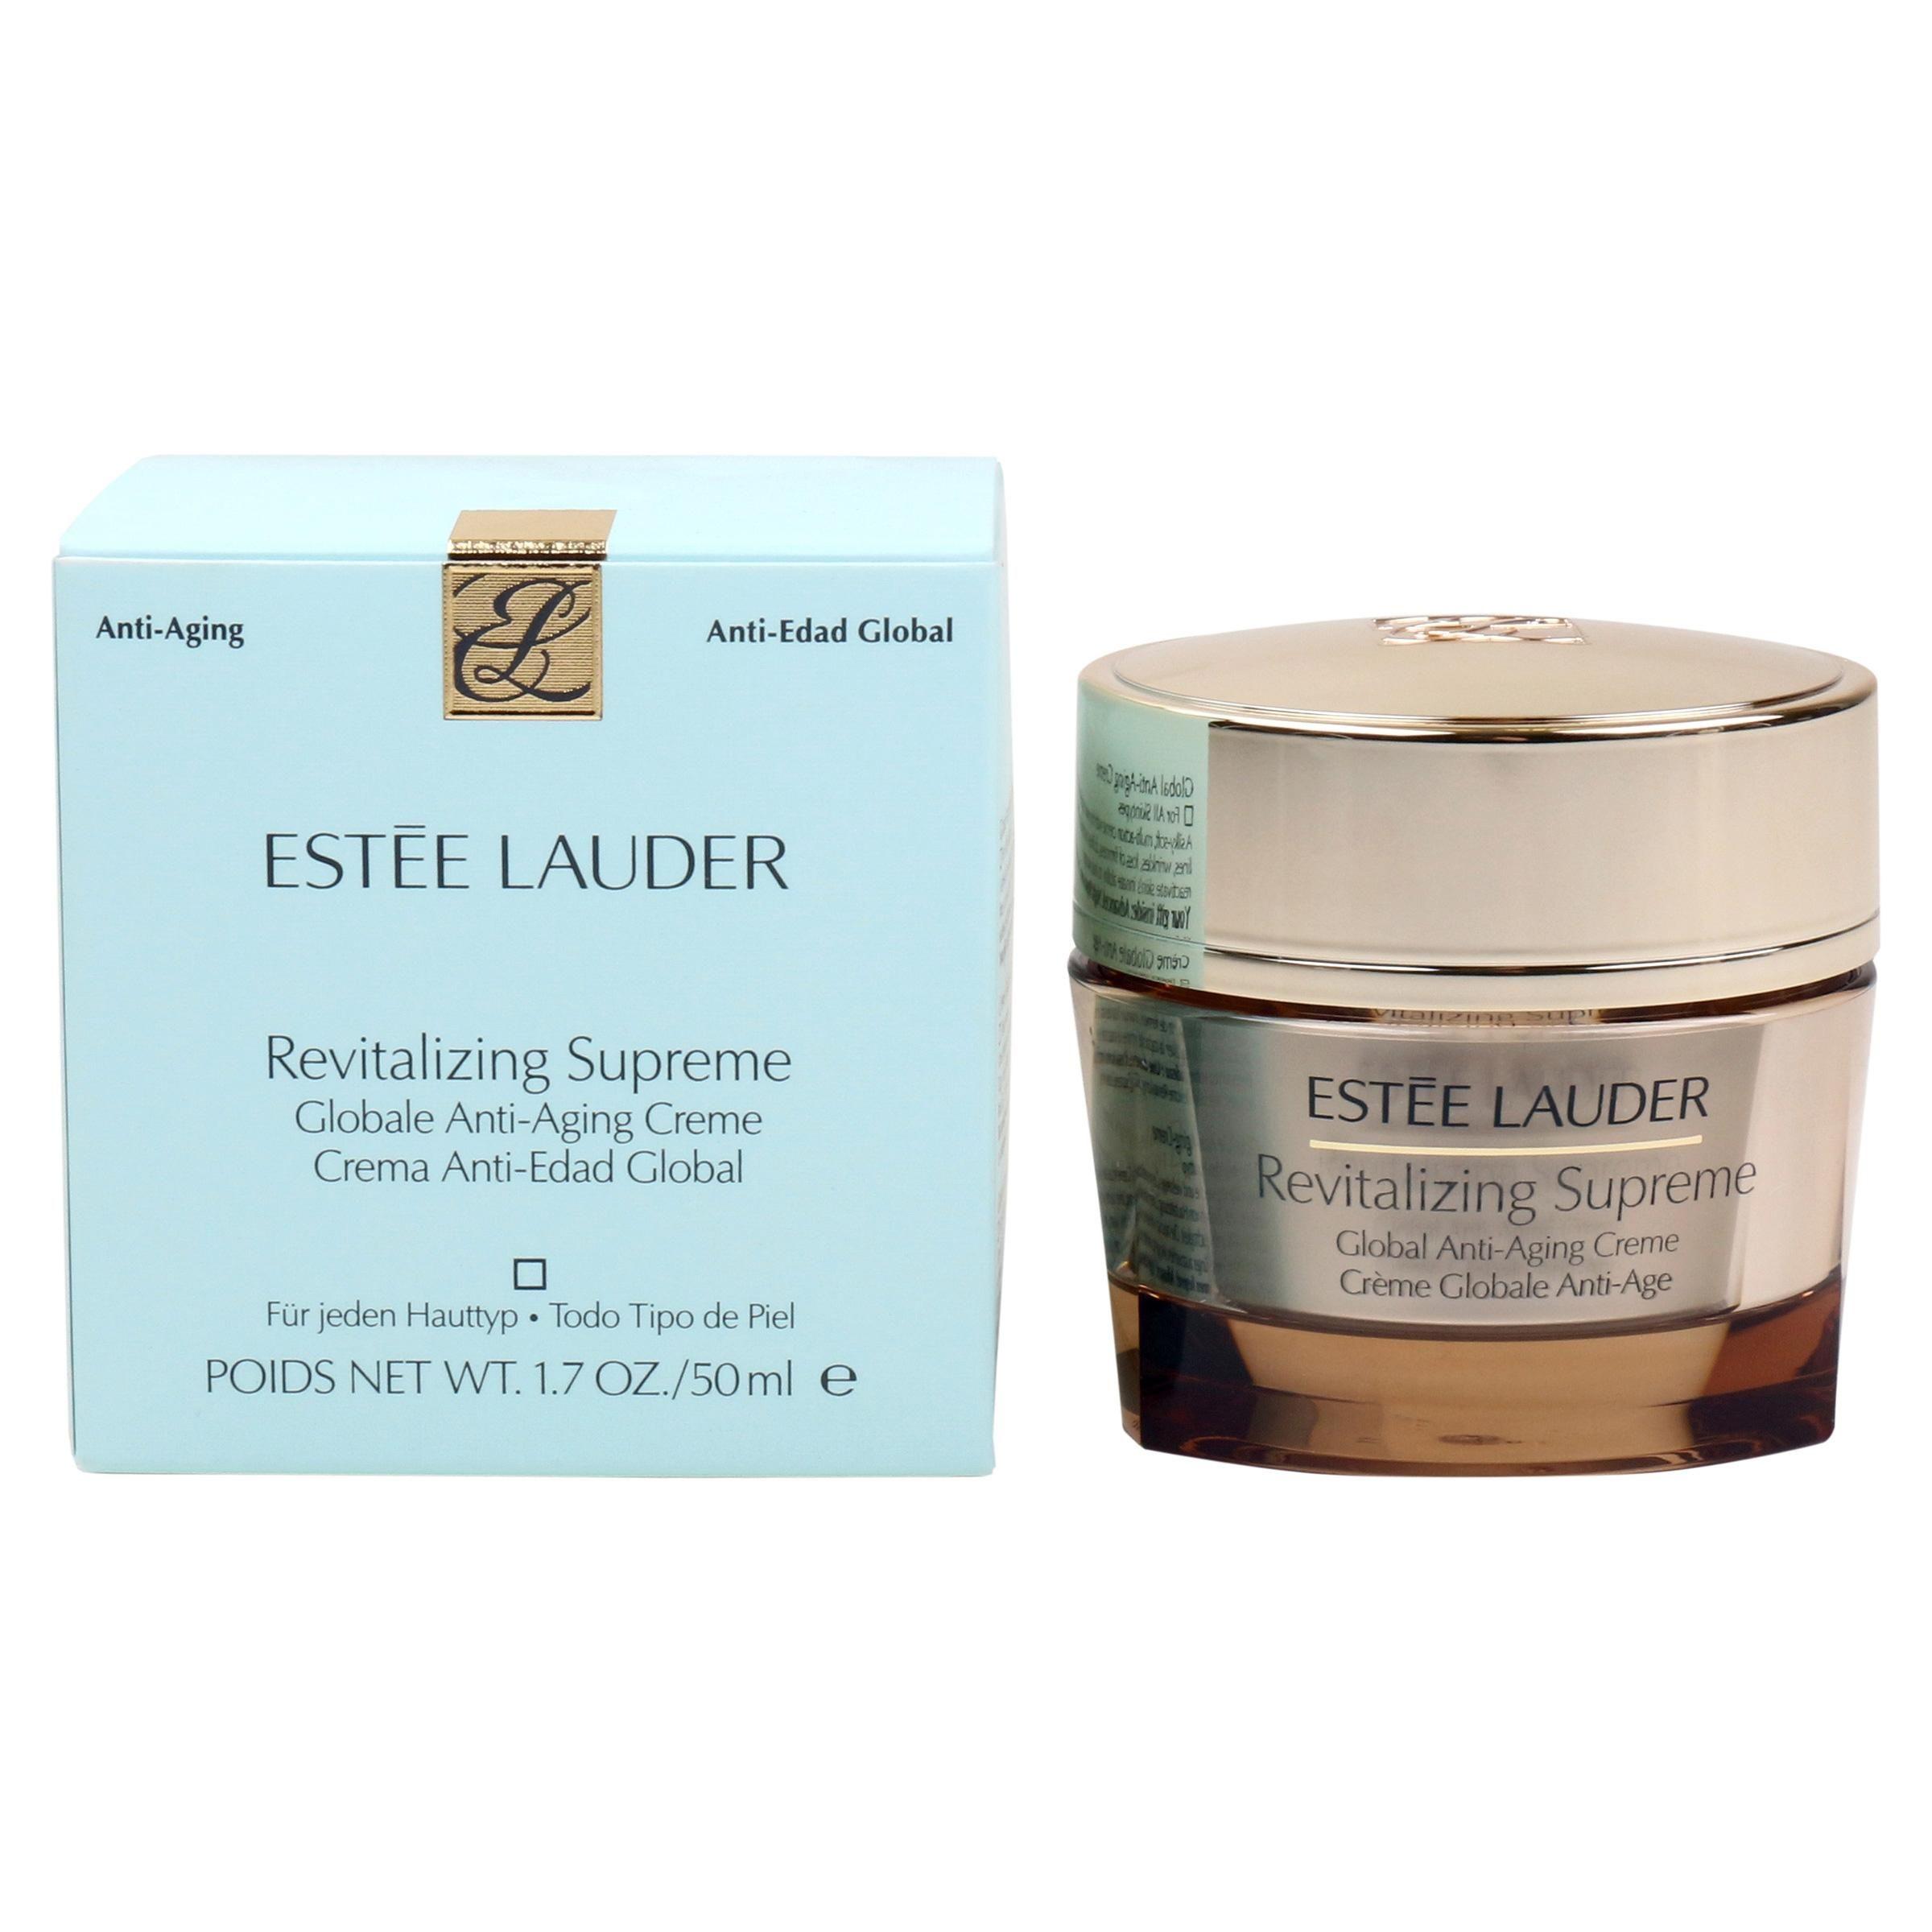 Estee Lauder Revitalizing Supreme Global AntiAging Crema 50 ml